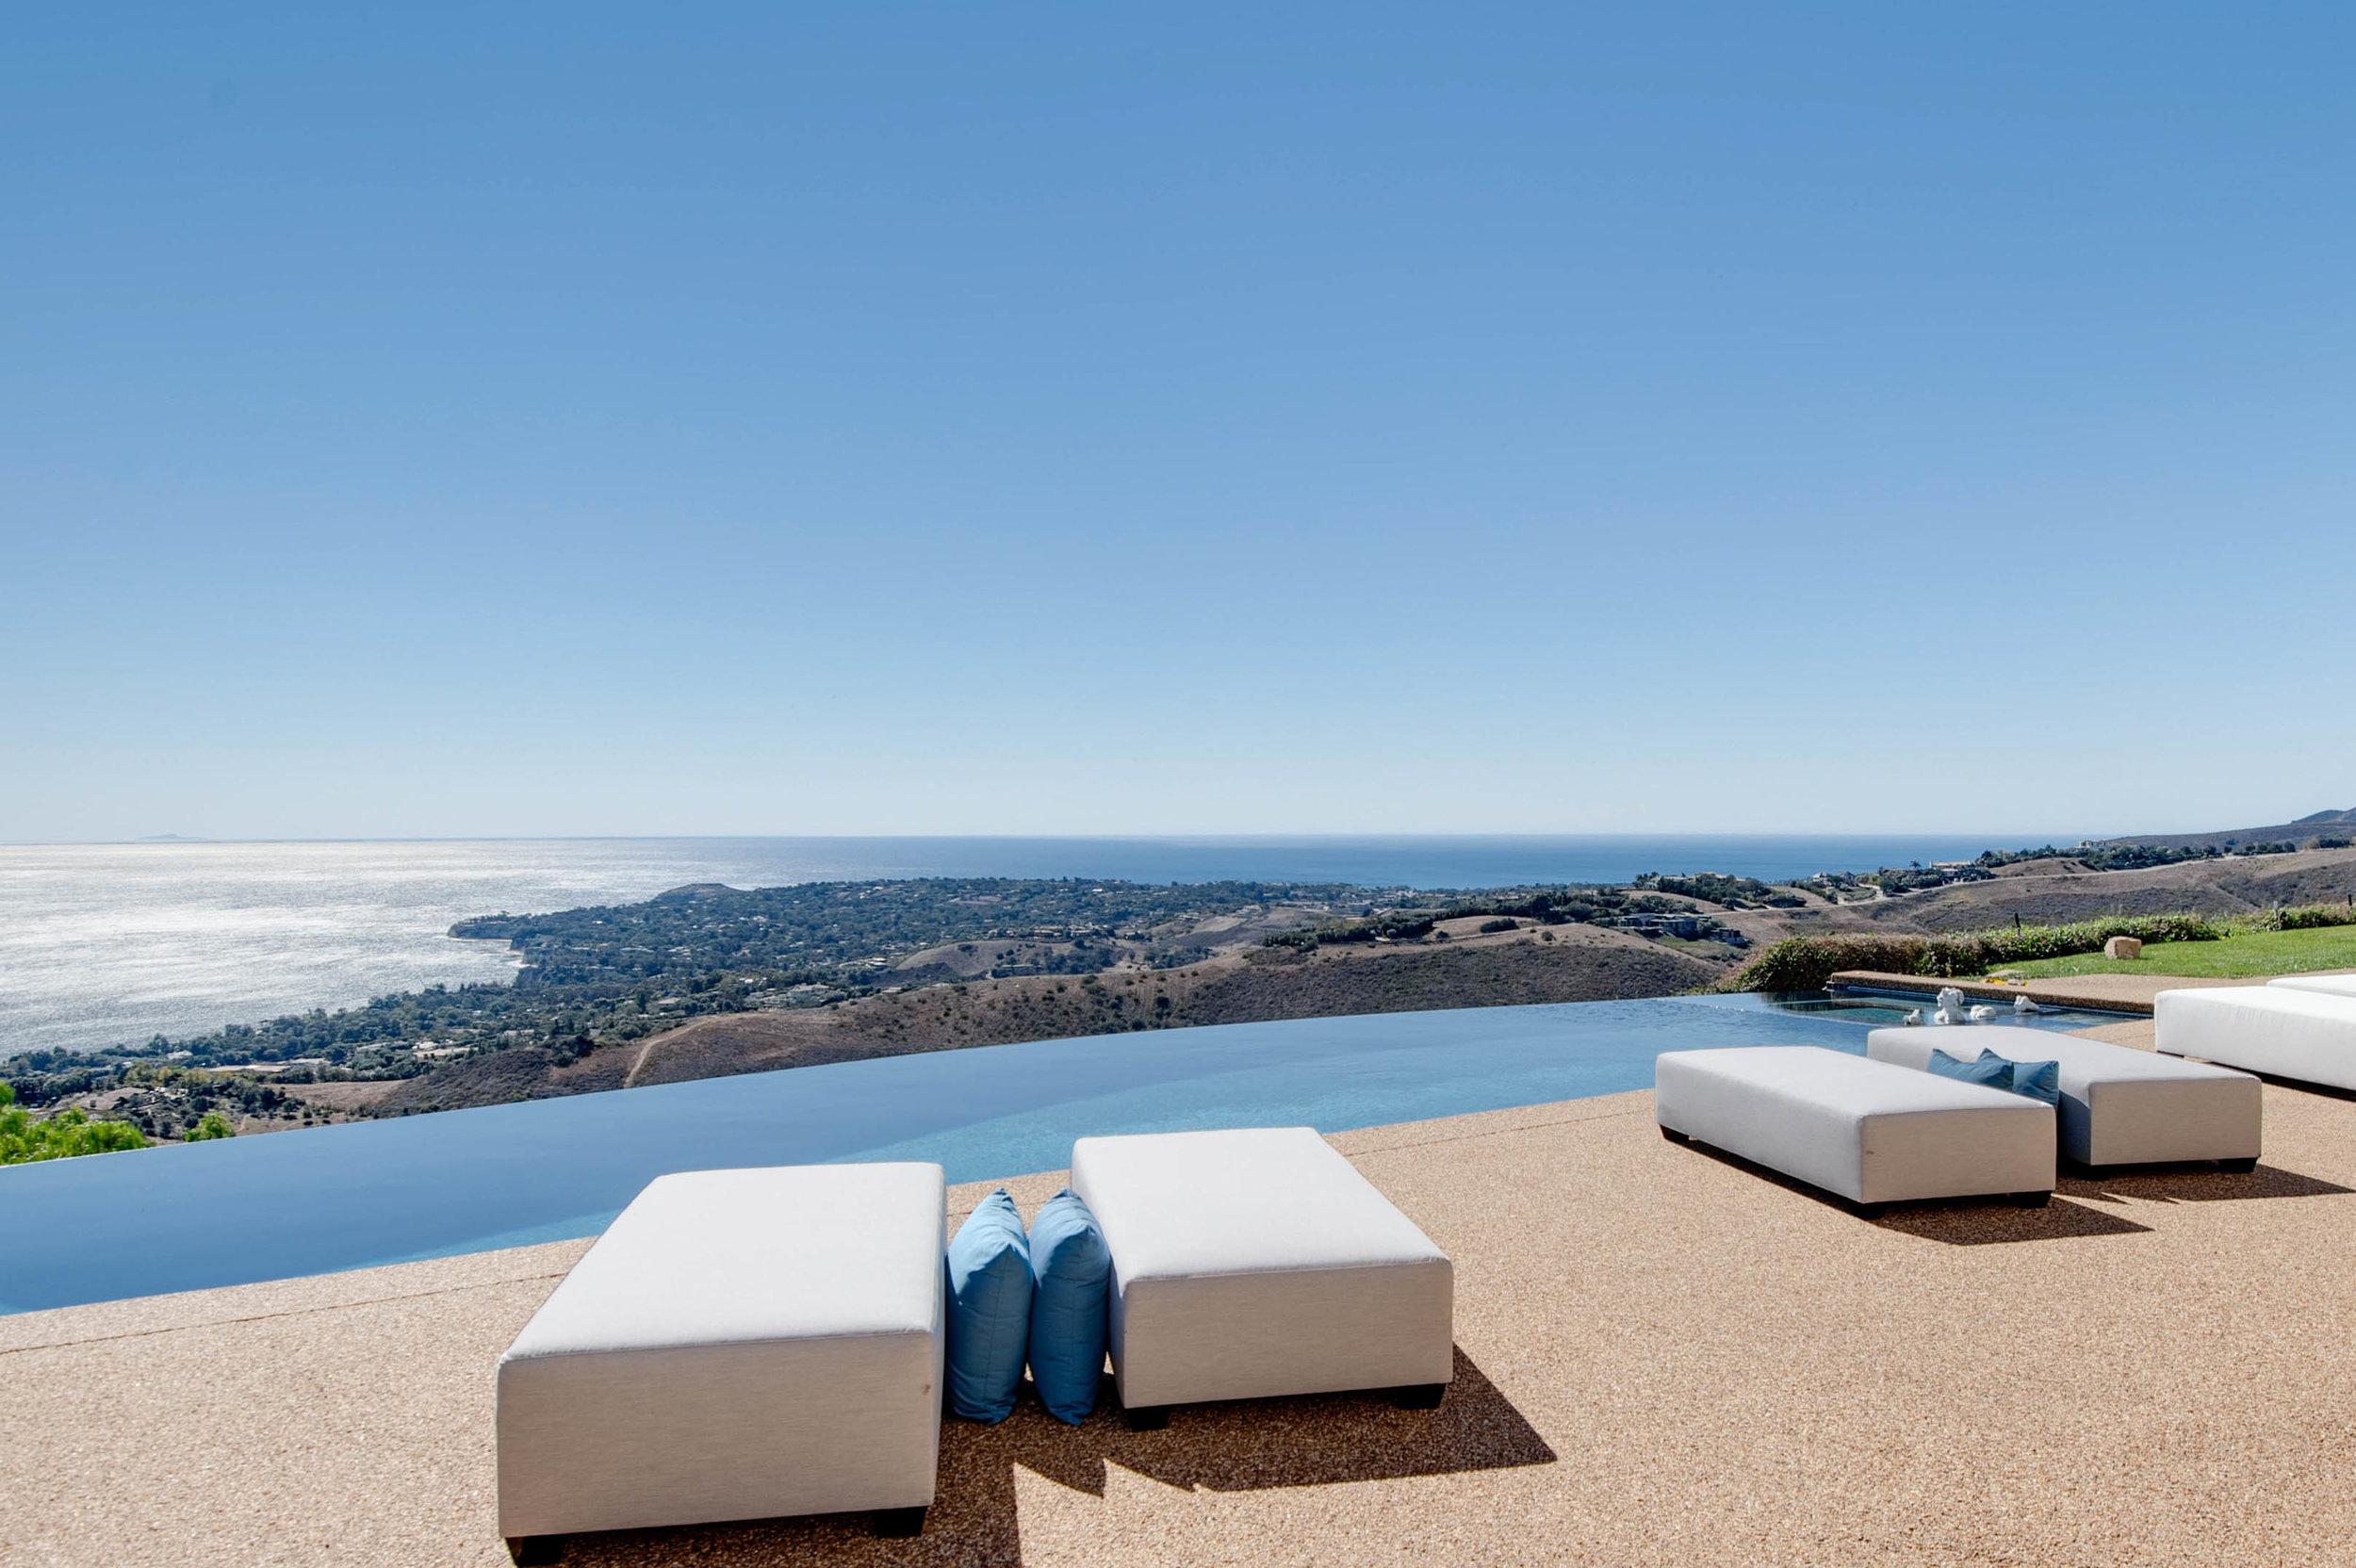 001 Pool Ocean View 27475 Latigo Bay View Drive For Sale Lease The Malibu Life Team Luxury Real Estate.jpg